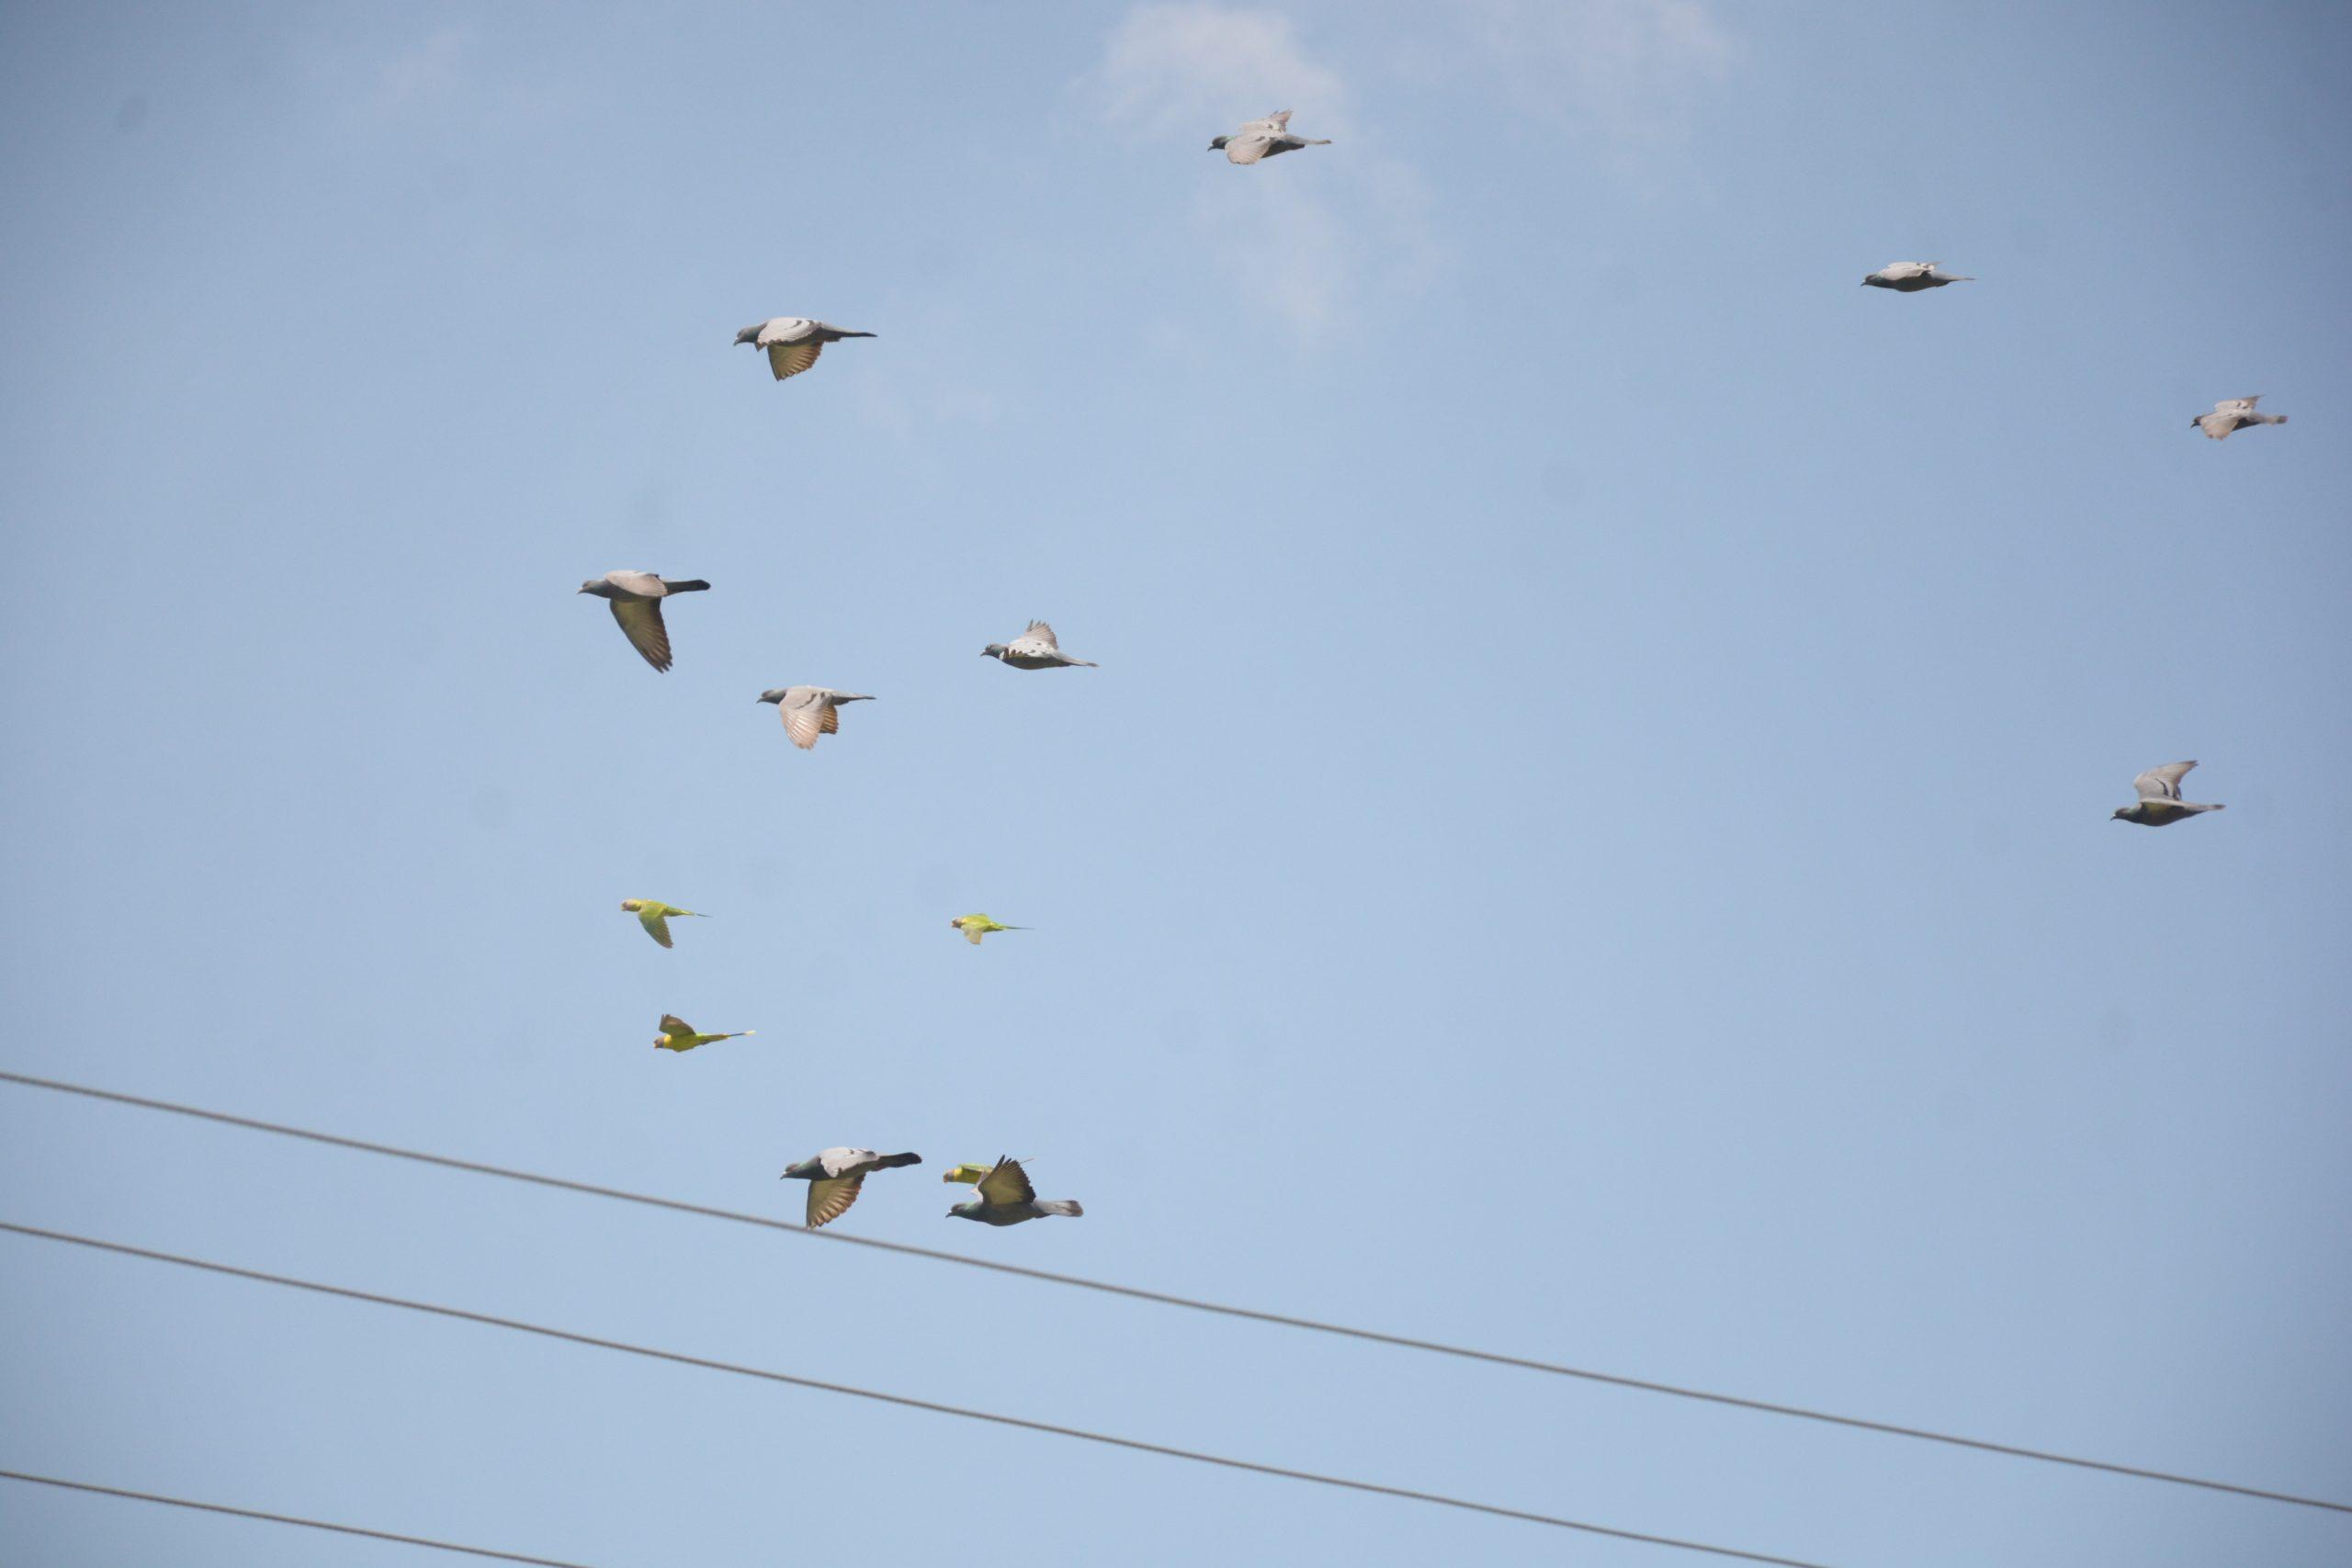 A Bird Migration on the Sky